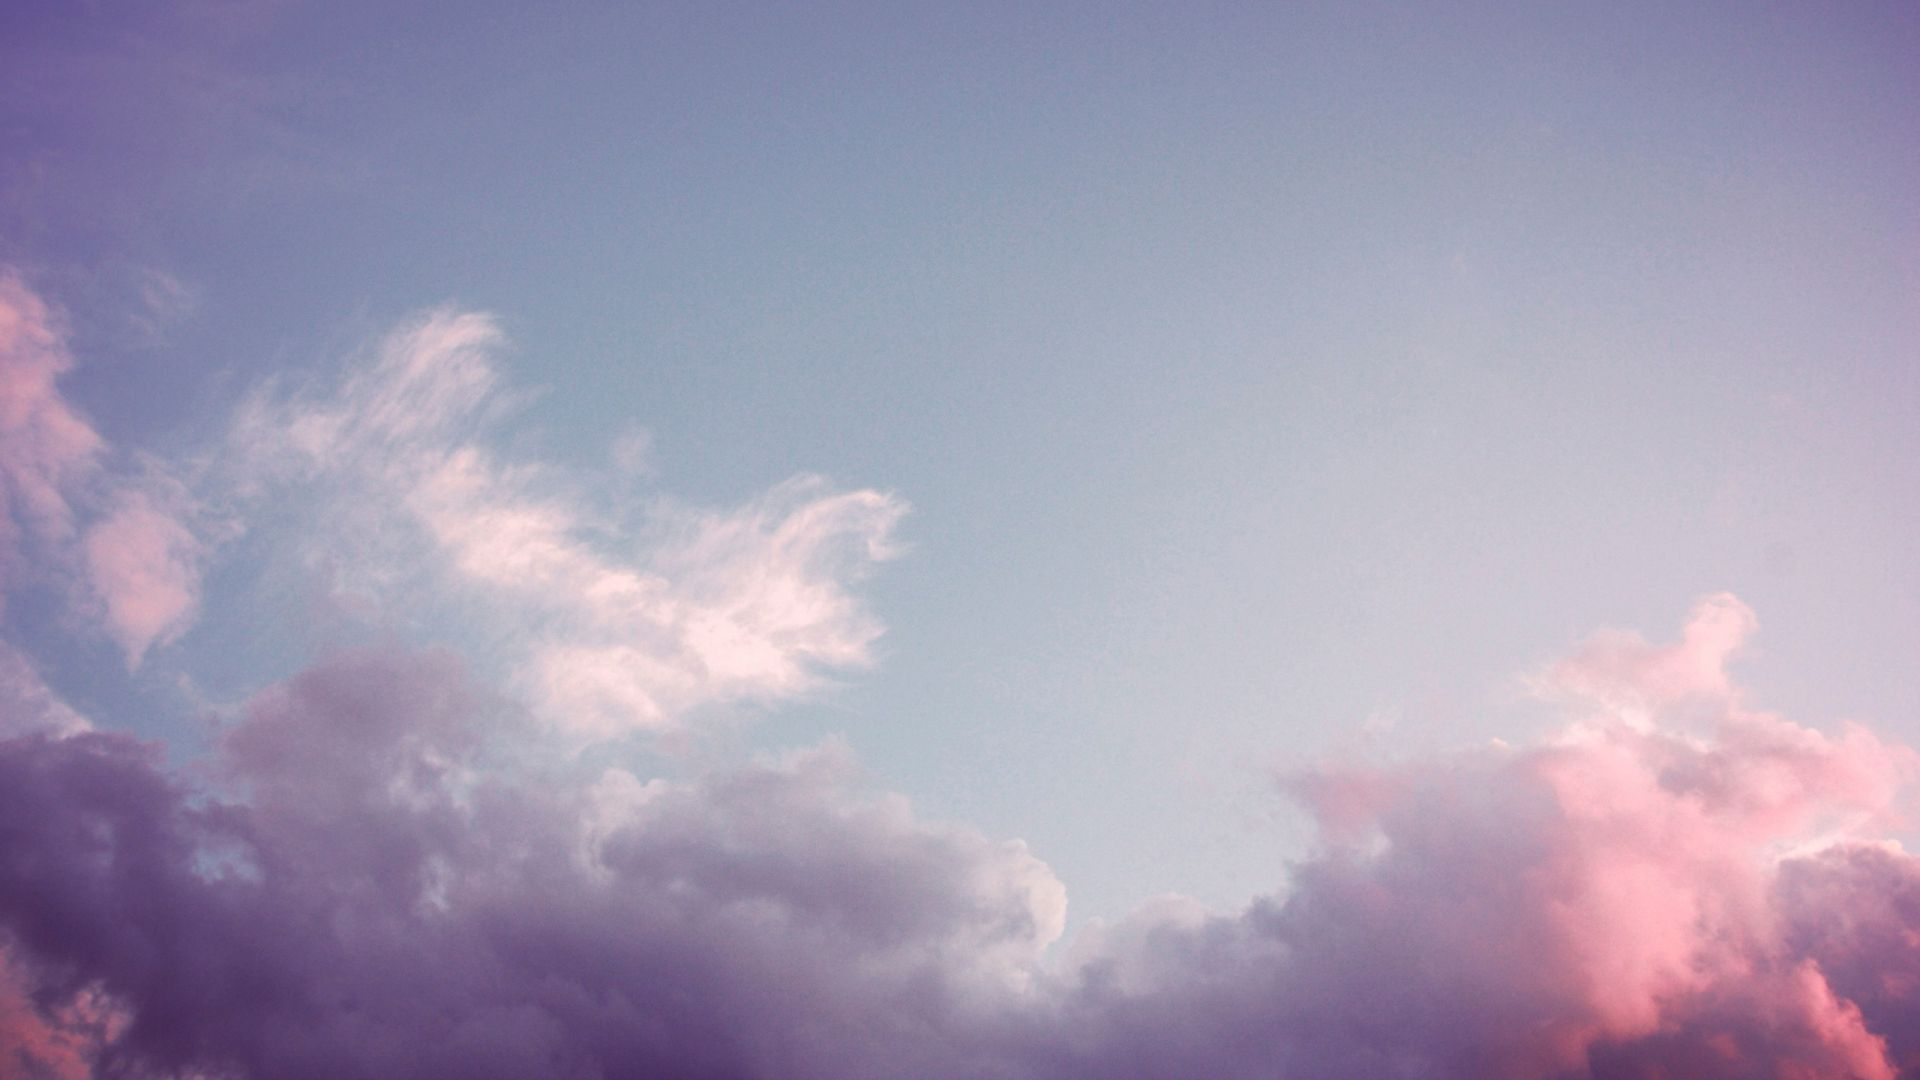 Aesthetic Cloud Wallpapers Top Free Aesthetic Cloud